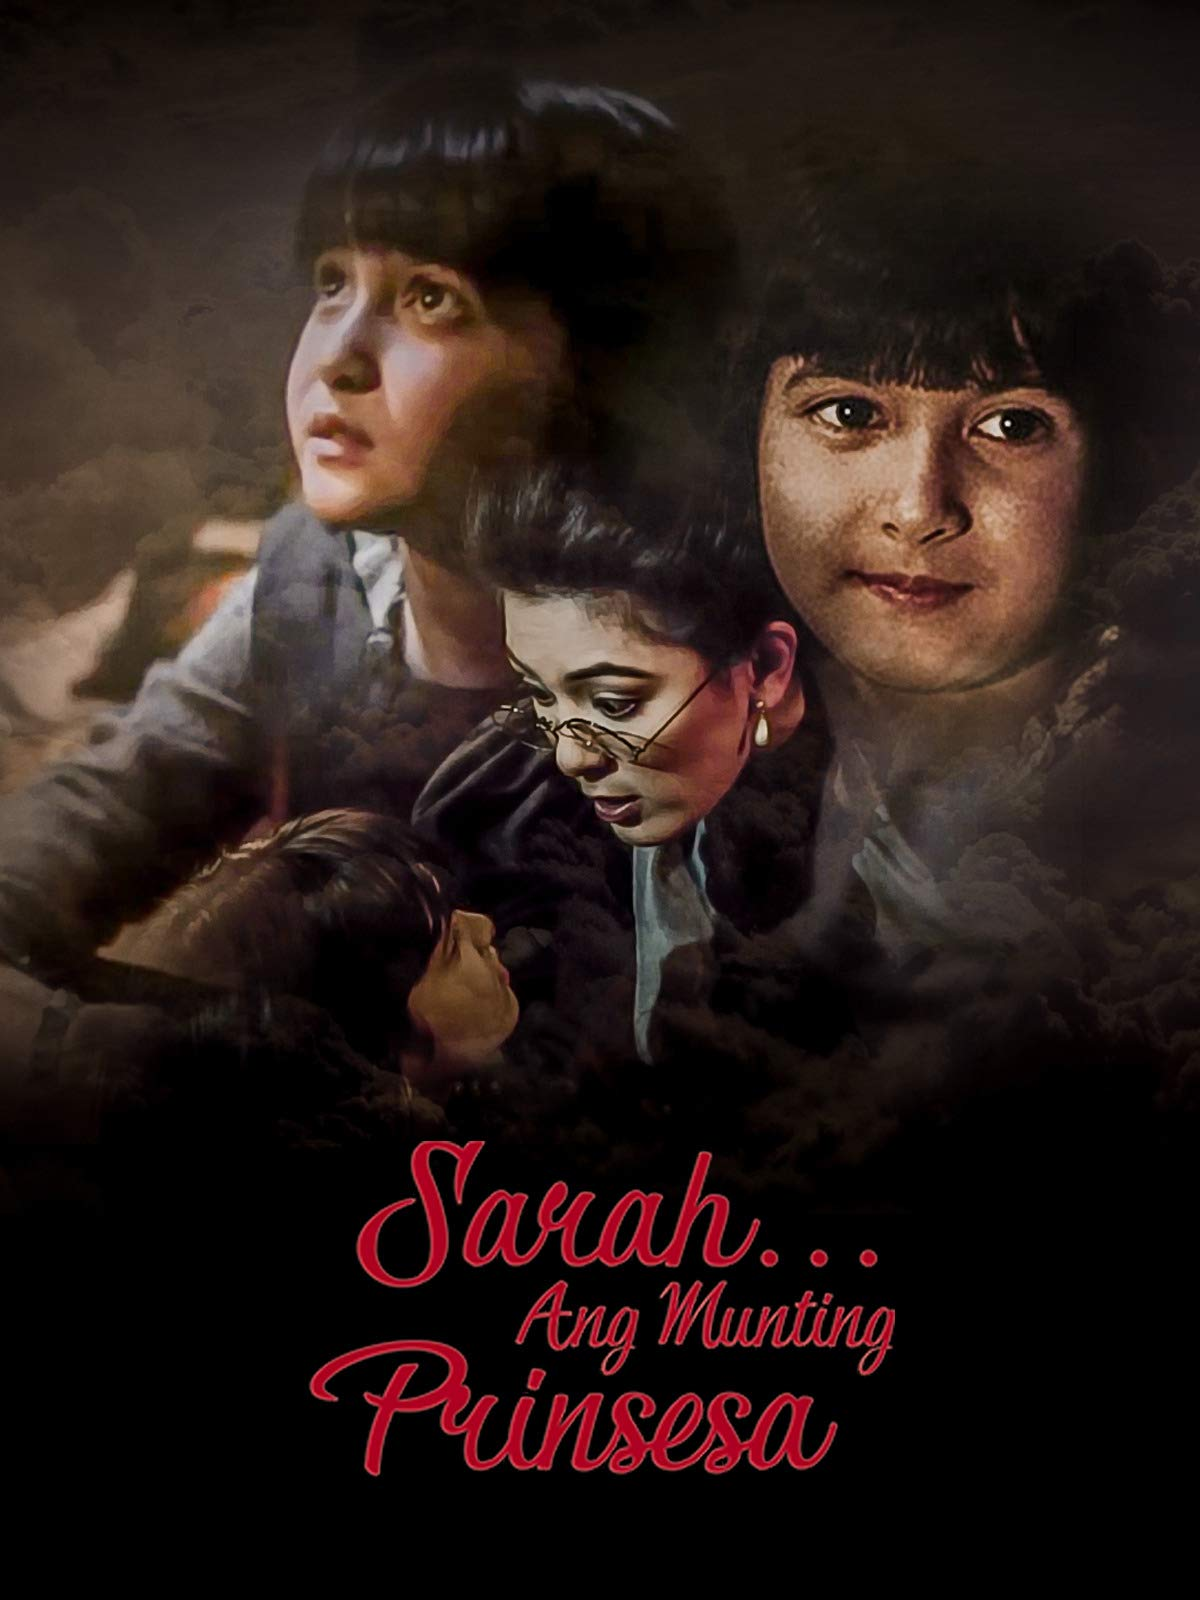 Amazon Com Sarah Ang Munting Prinsesa Camille Pratts Angelica Panganiban Jean Garcia Angelica Pedersen